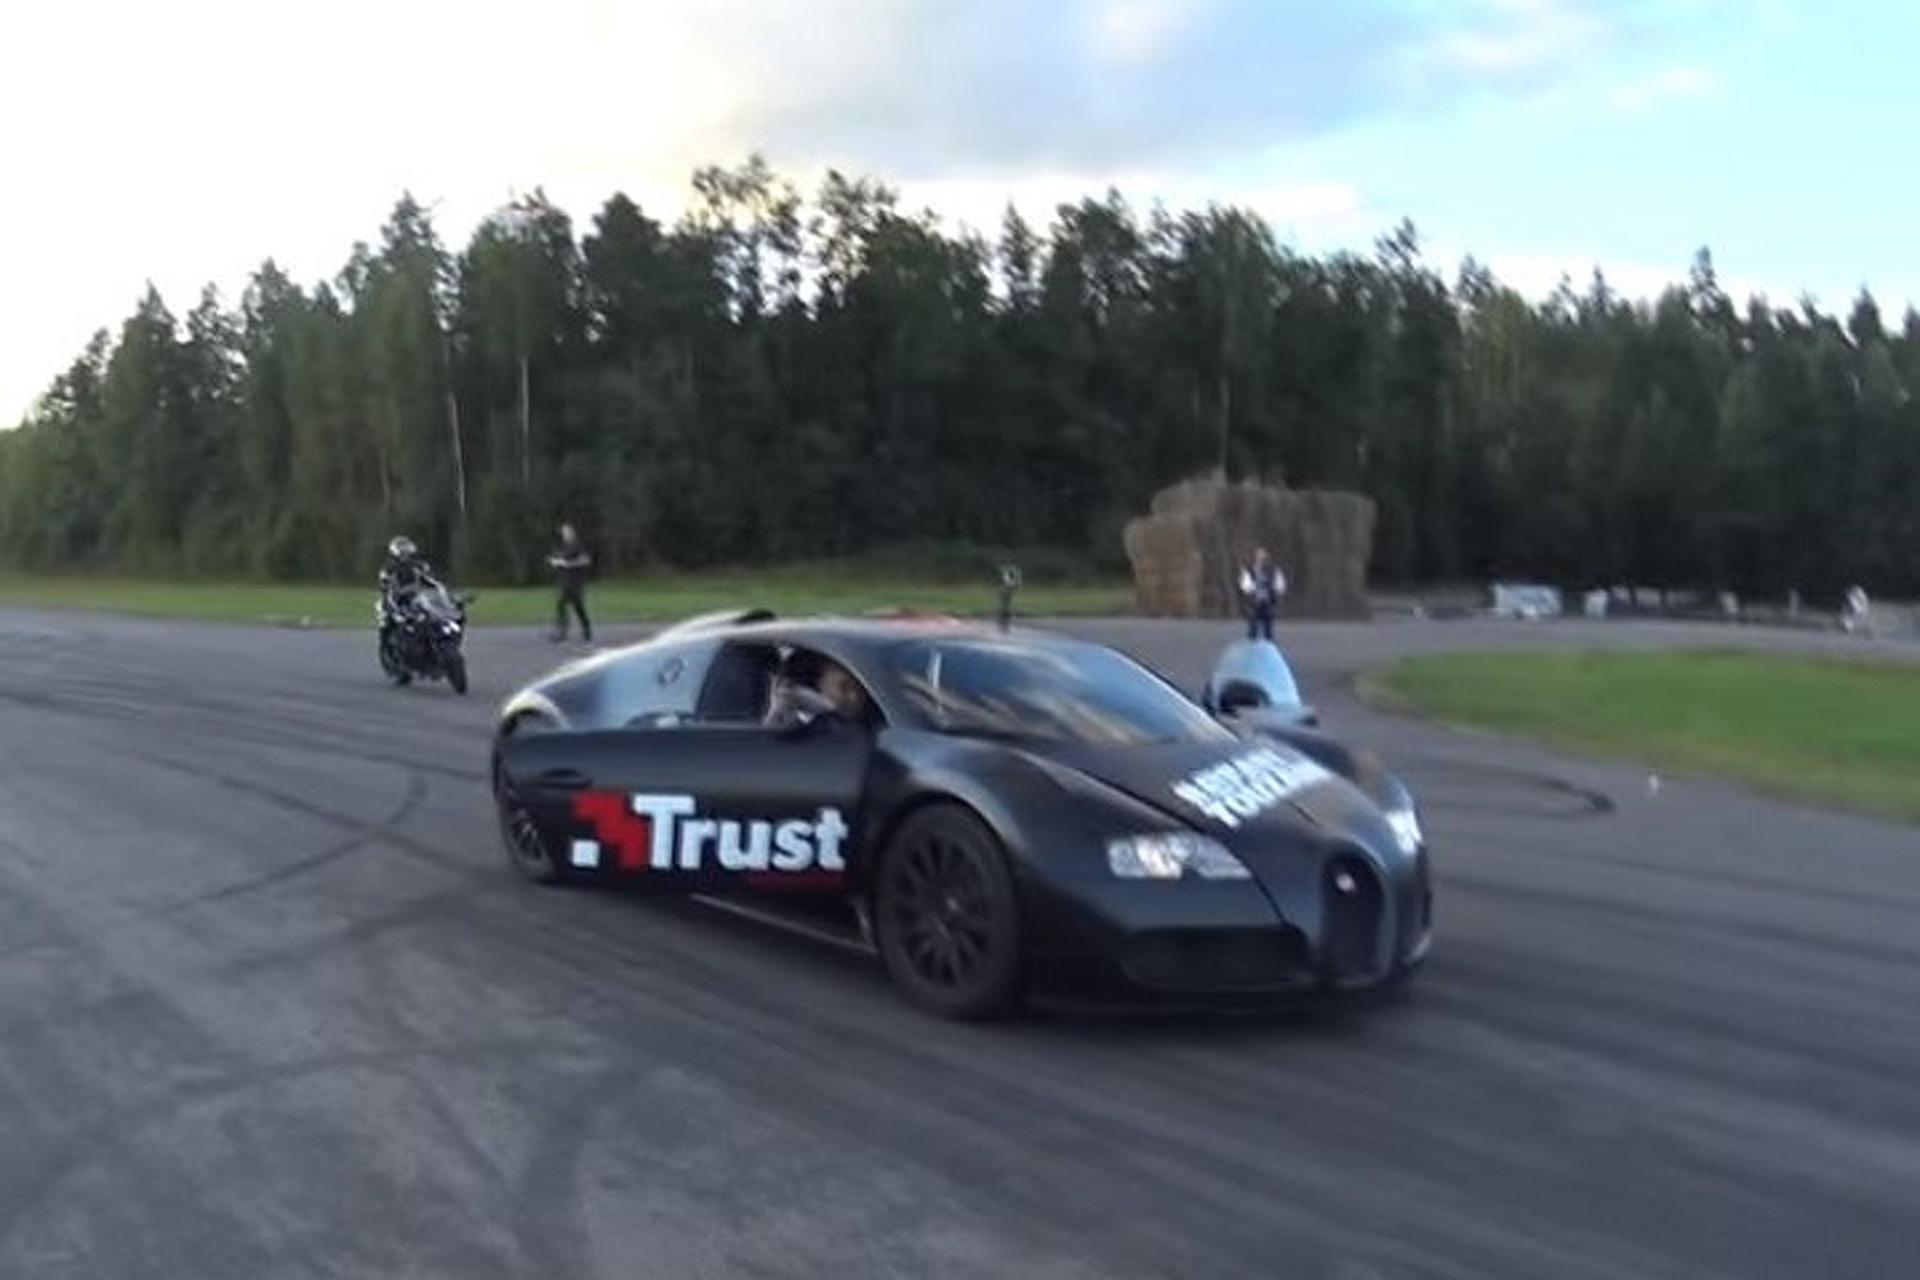 watch-kawasakis-evil-ninja-h2-race-a-bugatti-veyron-grand-sport-vitesse Fascinating Bugatti Veyron Grand Sport Vitesse 1/4 Mile Cars Trend